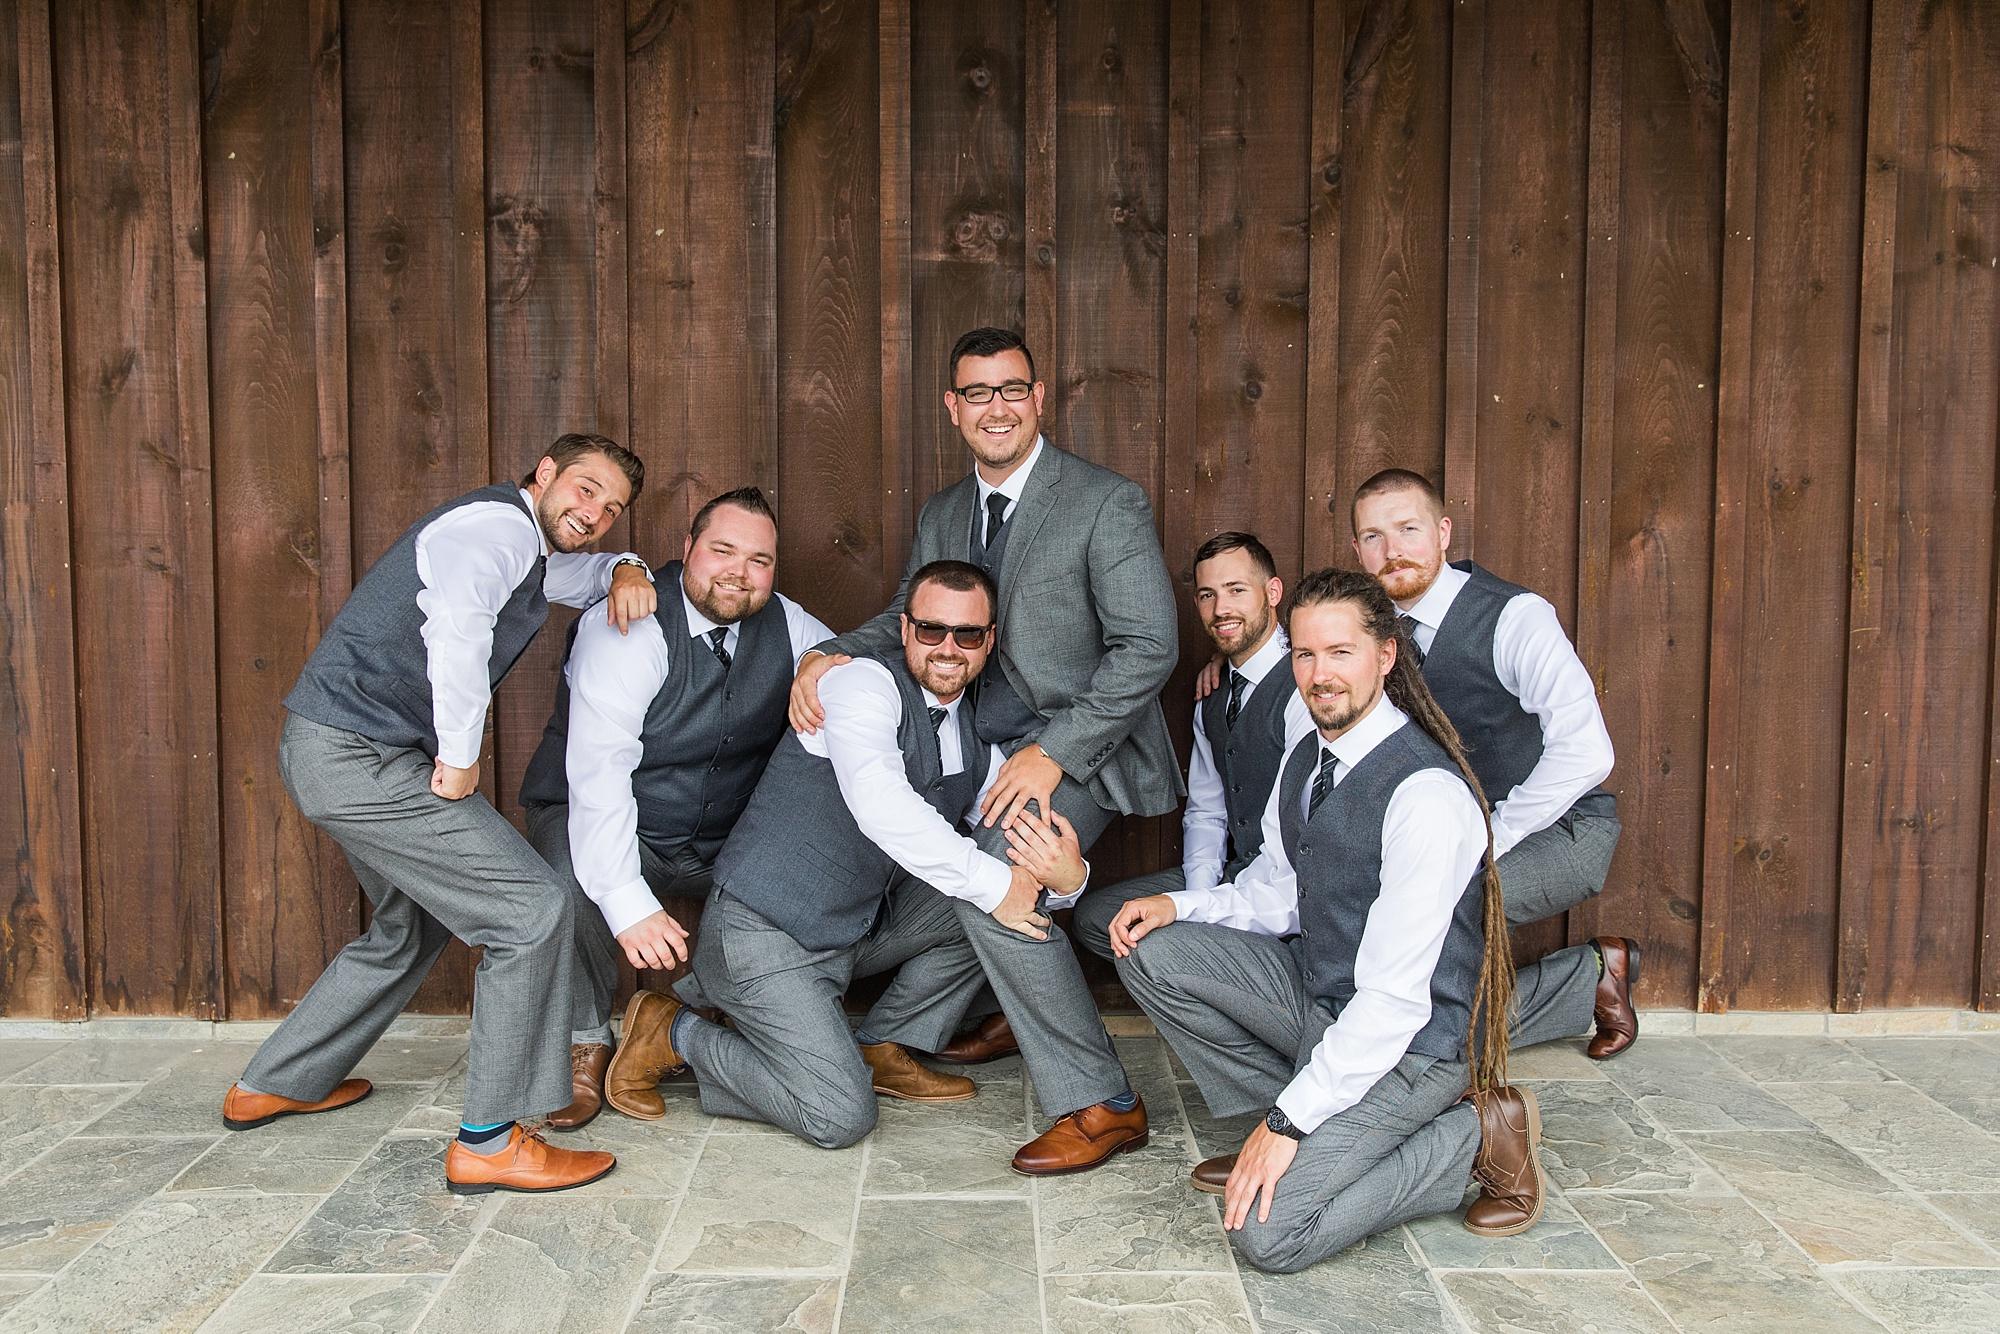 lipapark-hernderwinery-wedding_0029.jpg